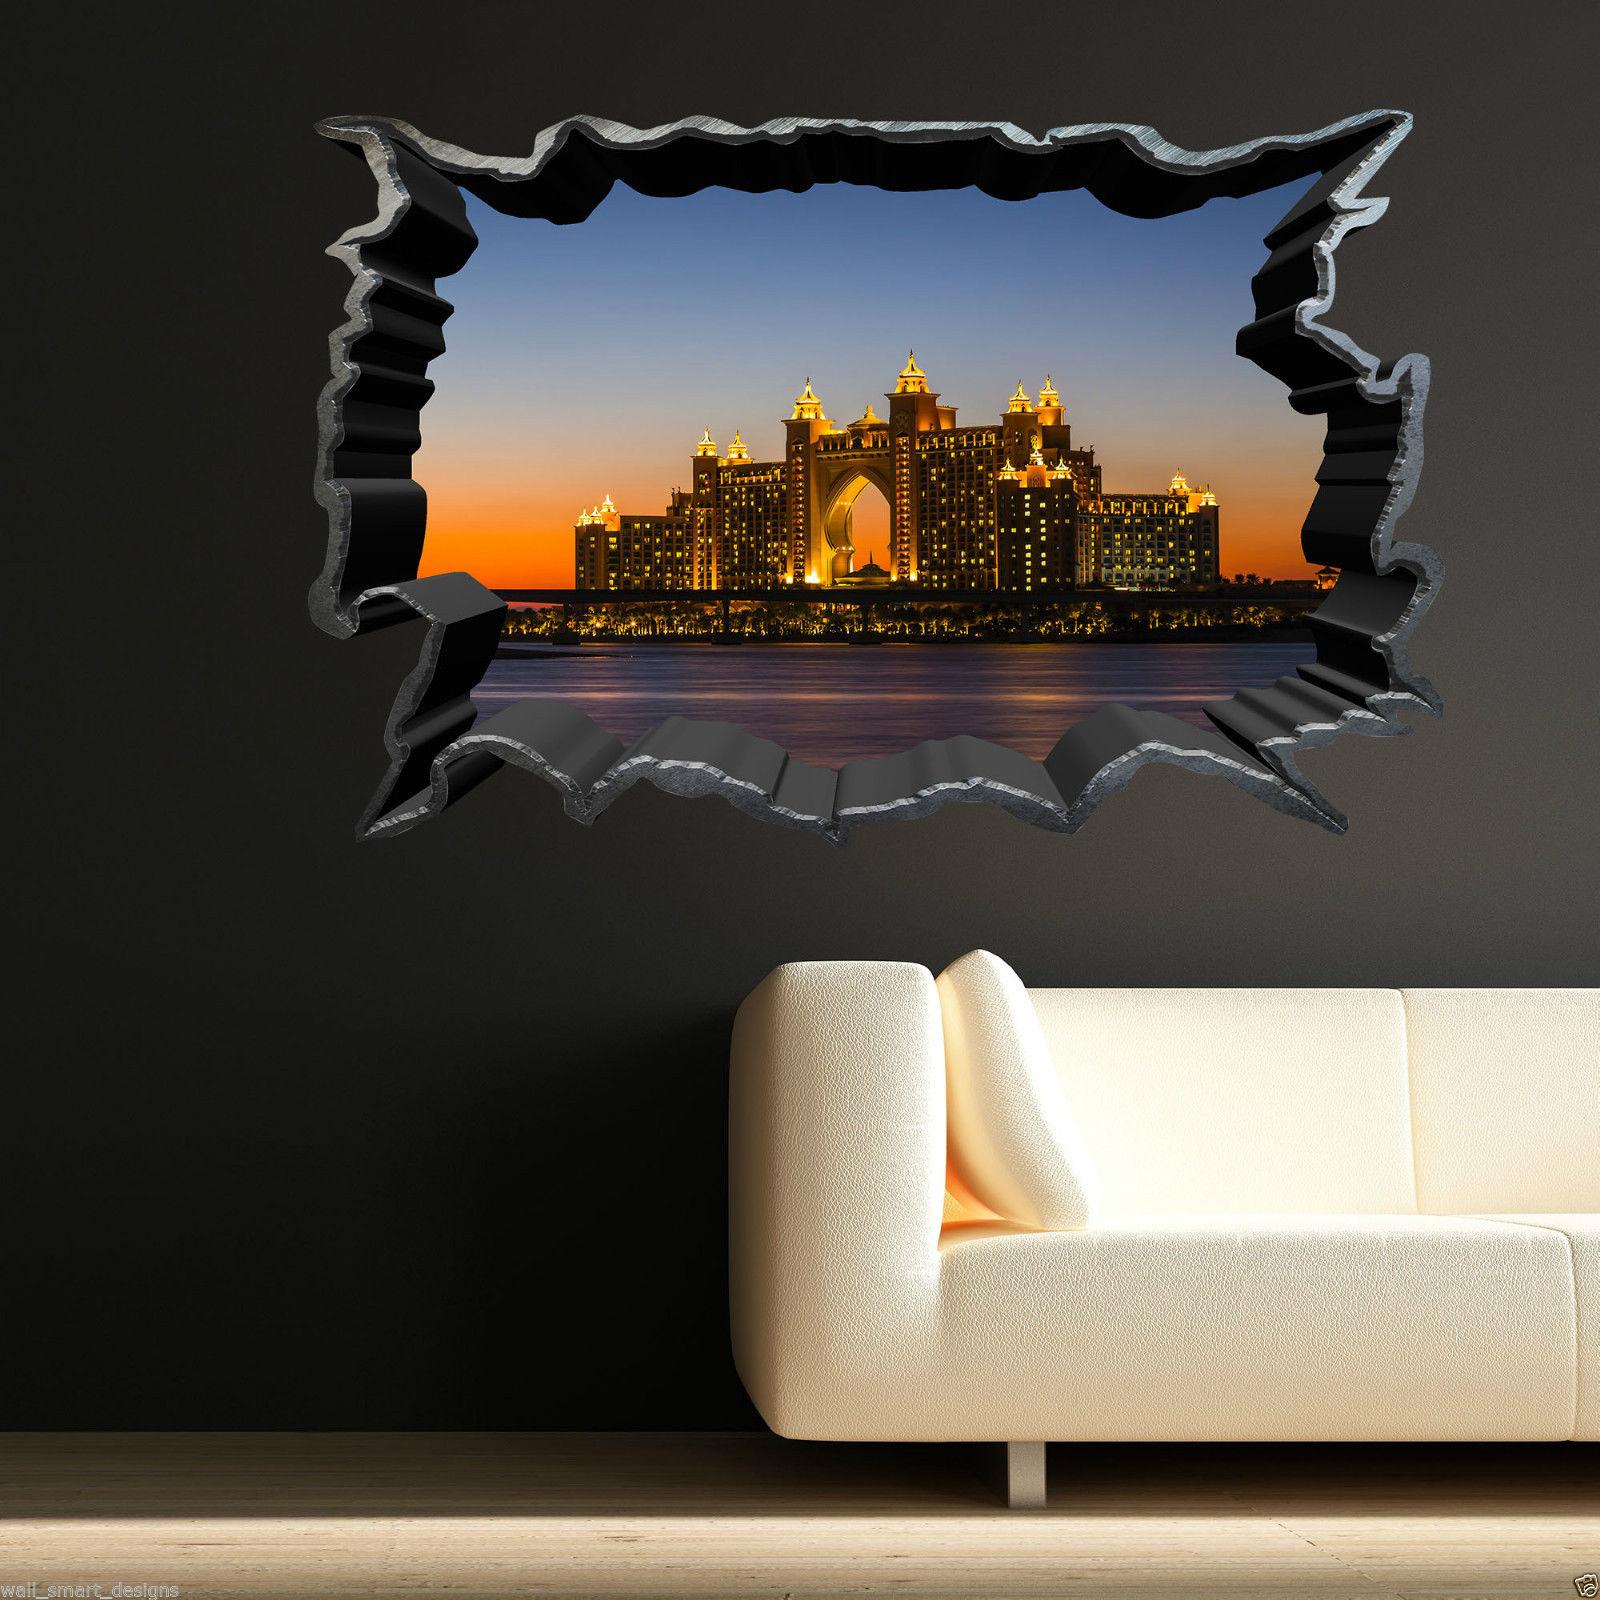 Full Colour SKYLINE SUNSET CITY wall art sticker decal transfer Graphic Print 2